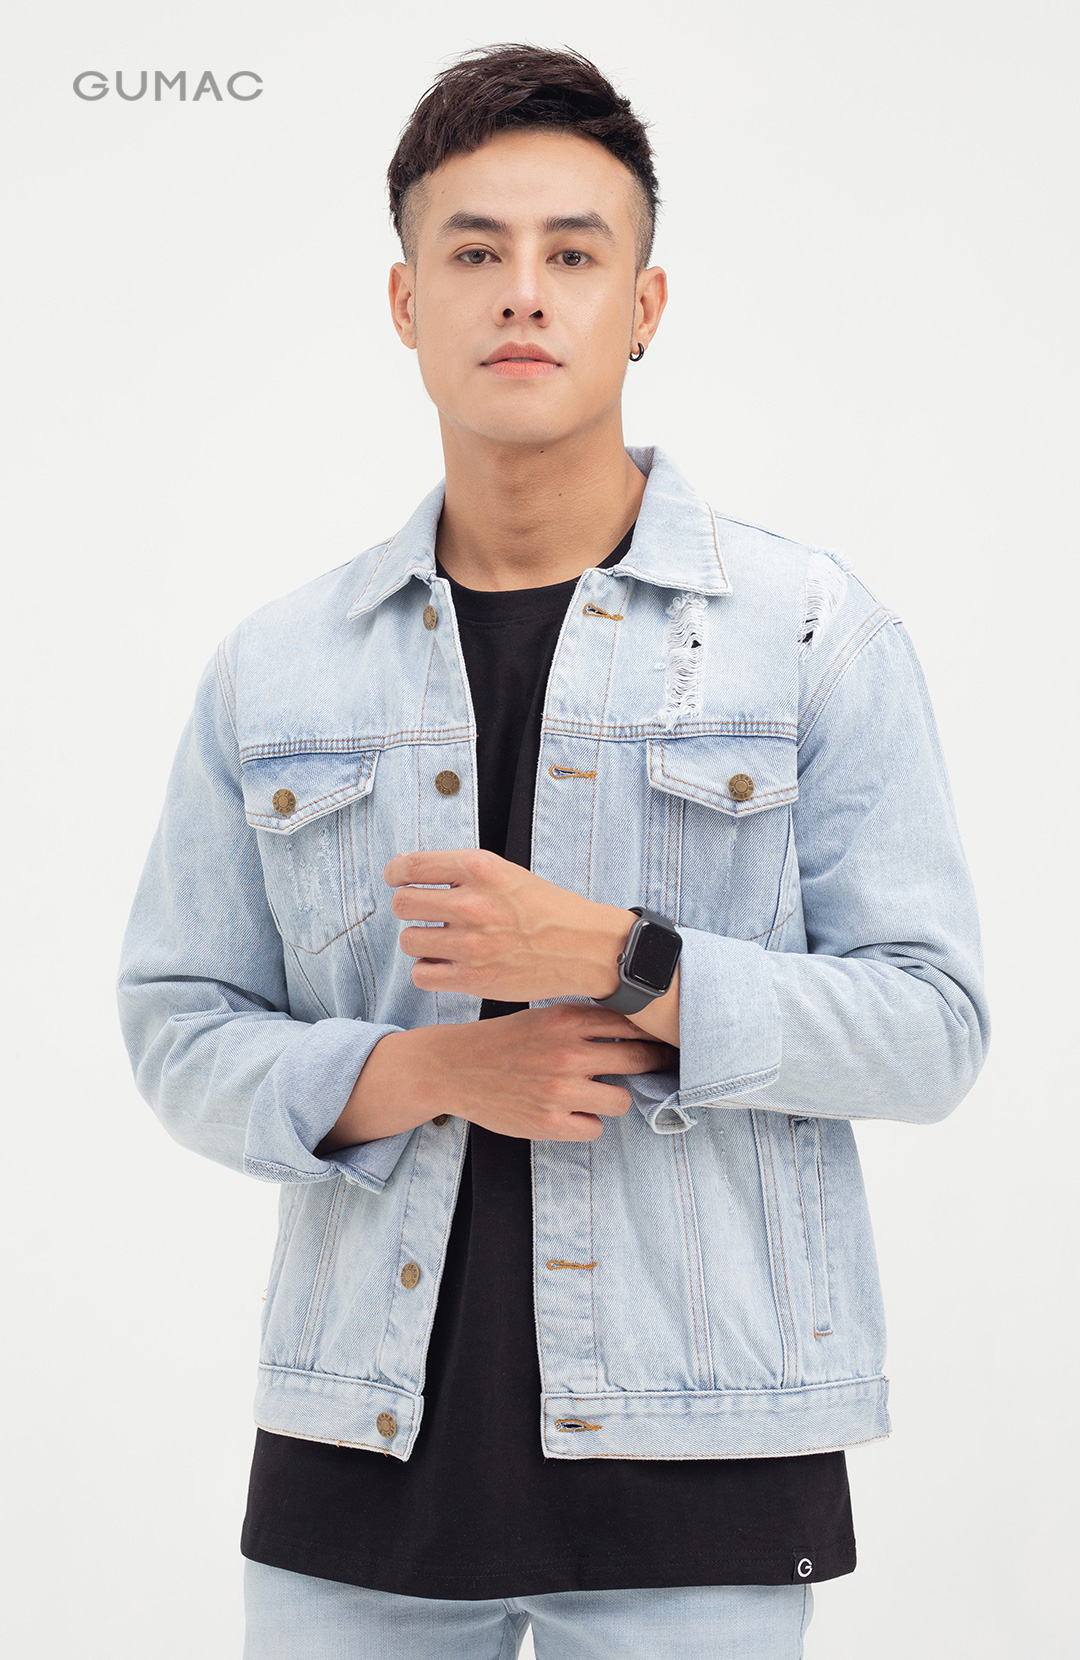 Áo khoác jeans cơ bản